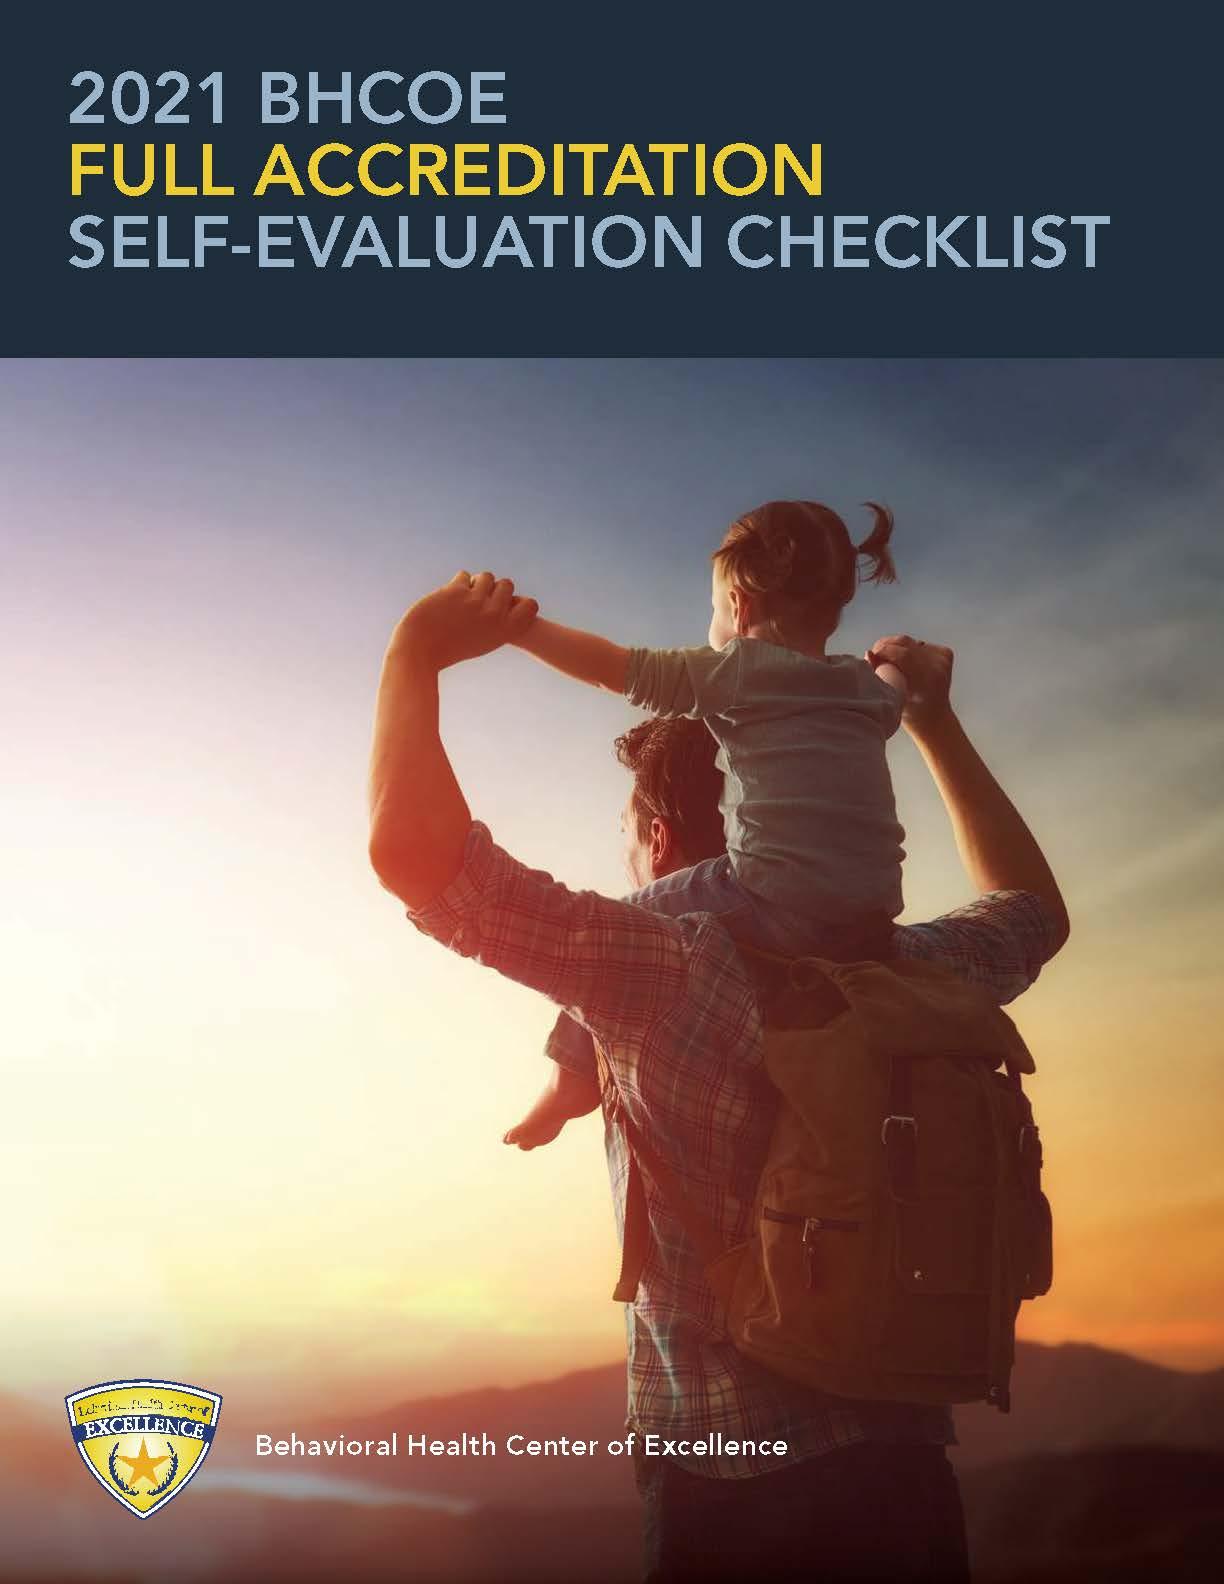 2021 Full Accreditation Self-Evaluation Checklist